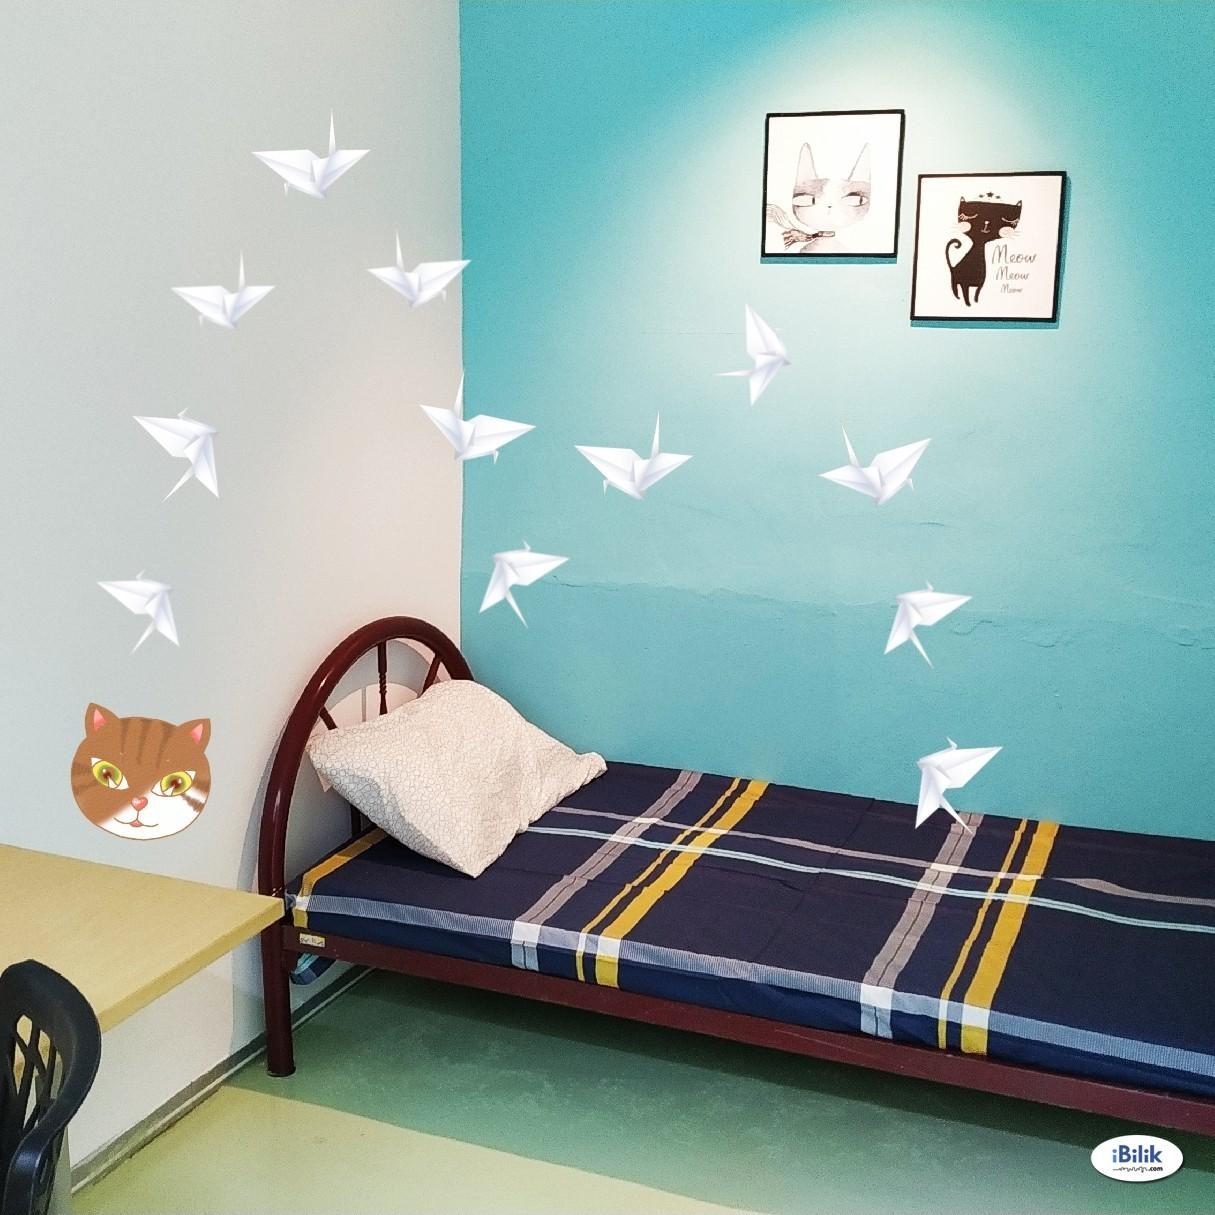 Single Room at Merlimau, near Politeknik Merlimau, TNB KFC Secret Recipe Industrial Merlimau & Jasin